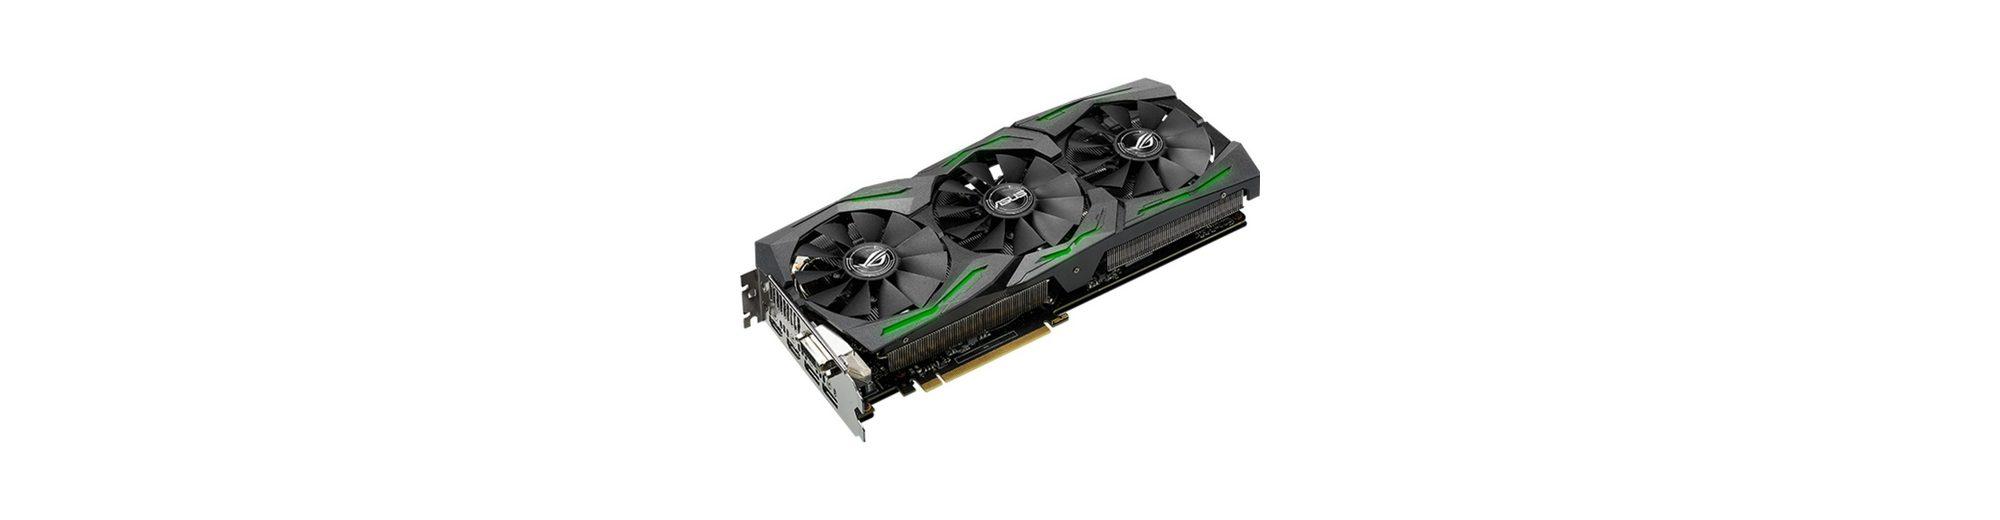 ASUS Grafikkarte »GeForce GTX 1070 STRIX OC GAMING«